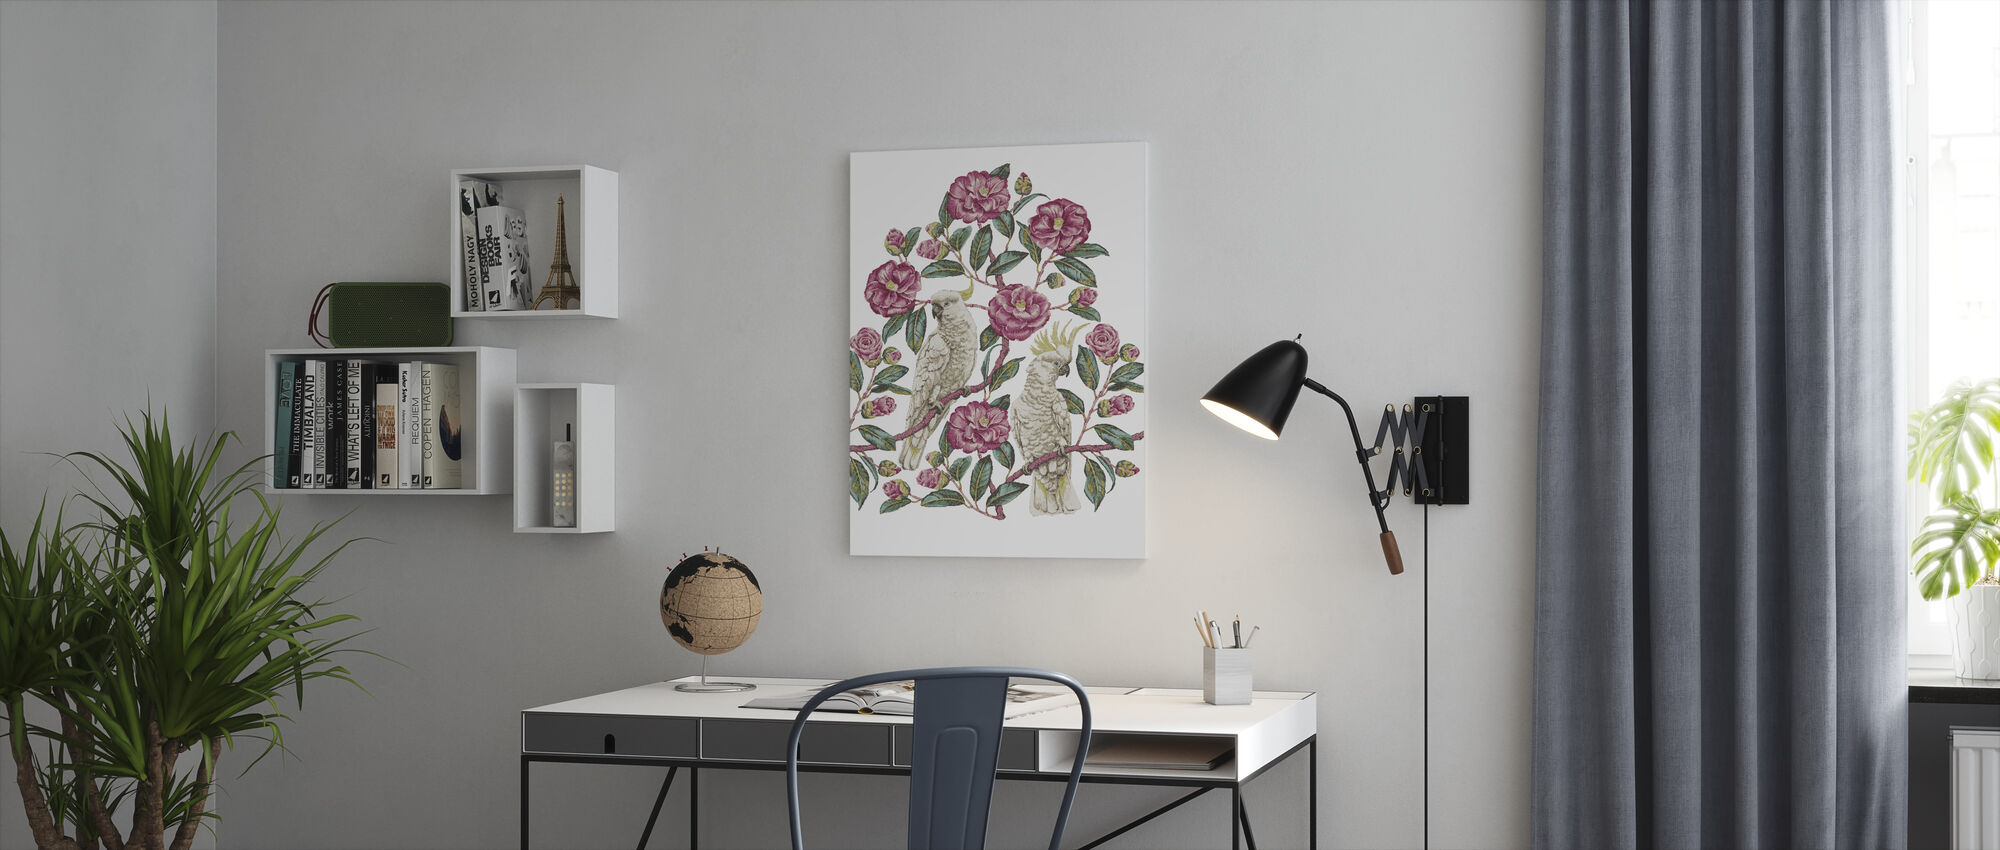 Kakadua paradis - Geranium och smaragd - Canvastavla - Kontor